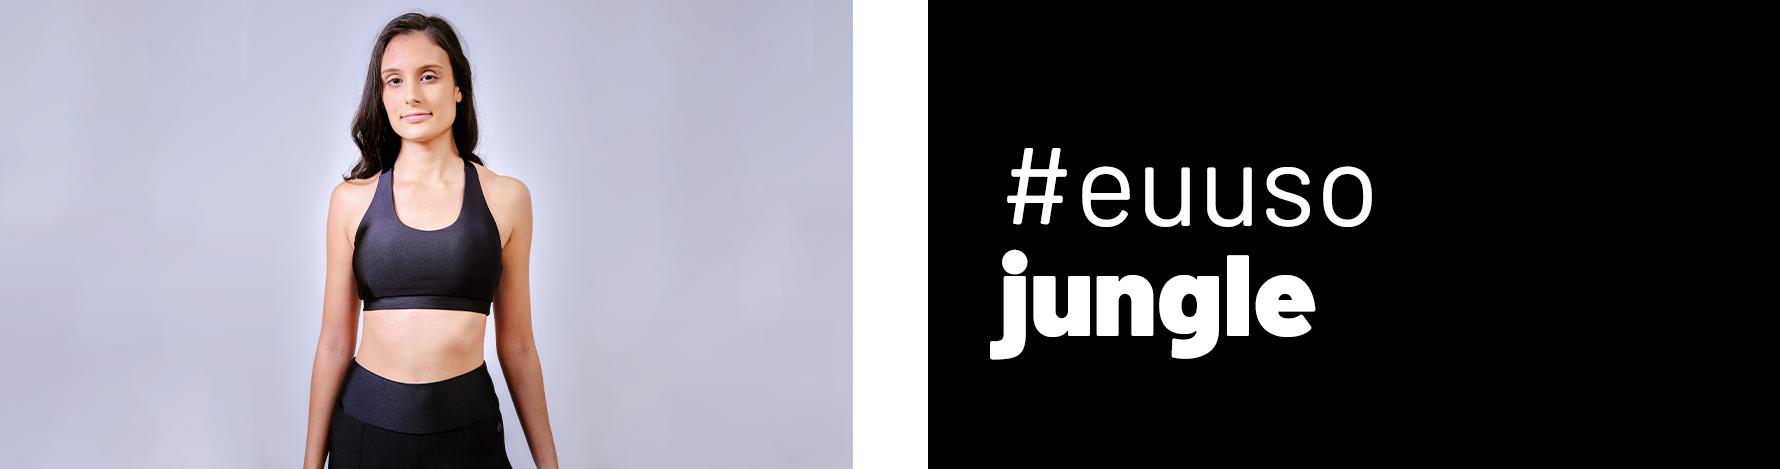 EuUsoJungle